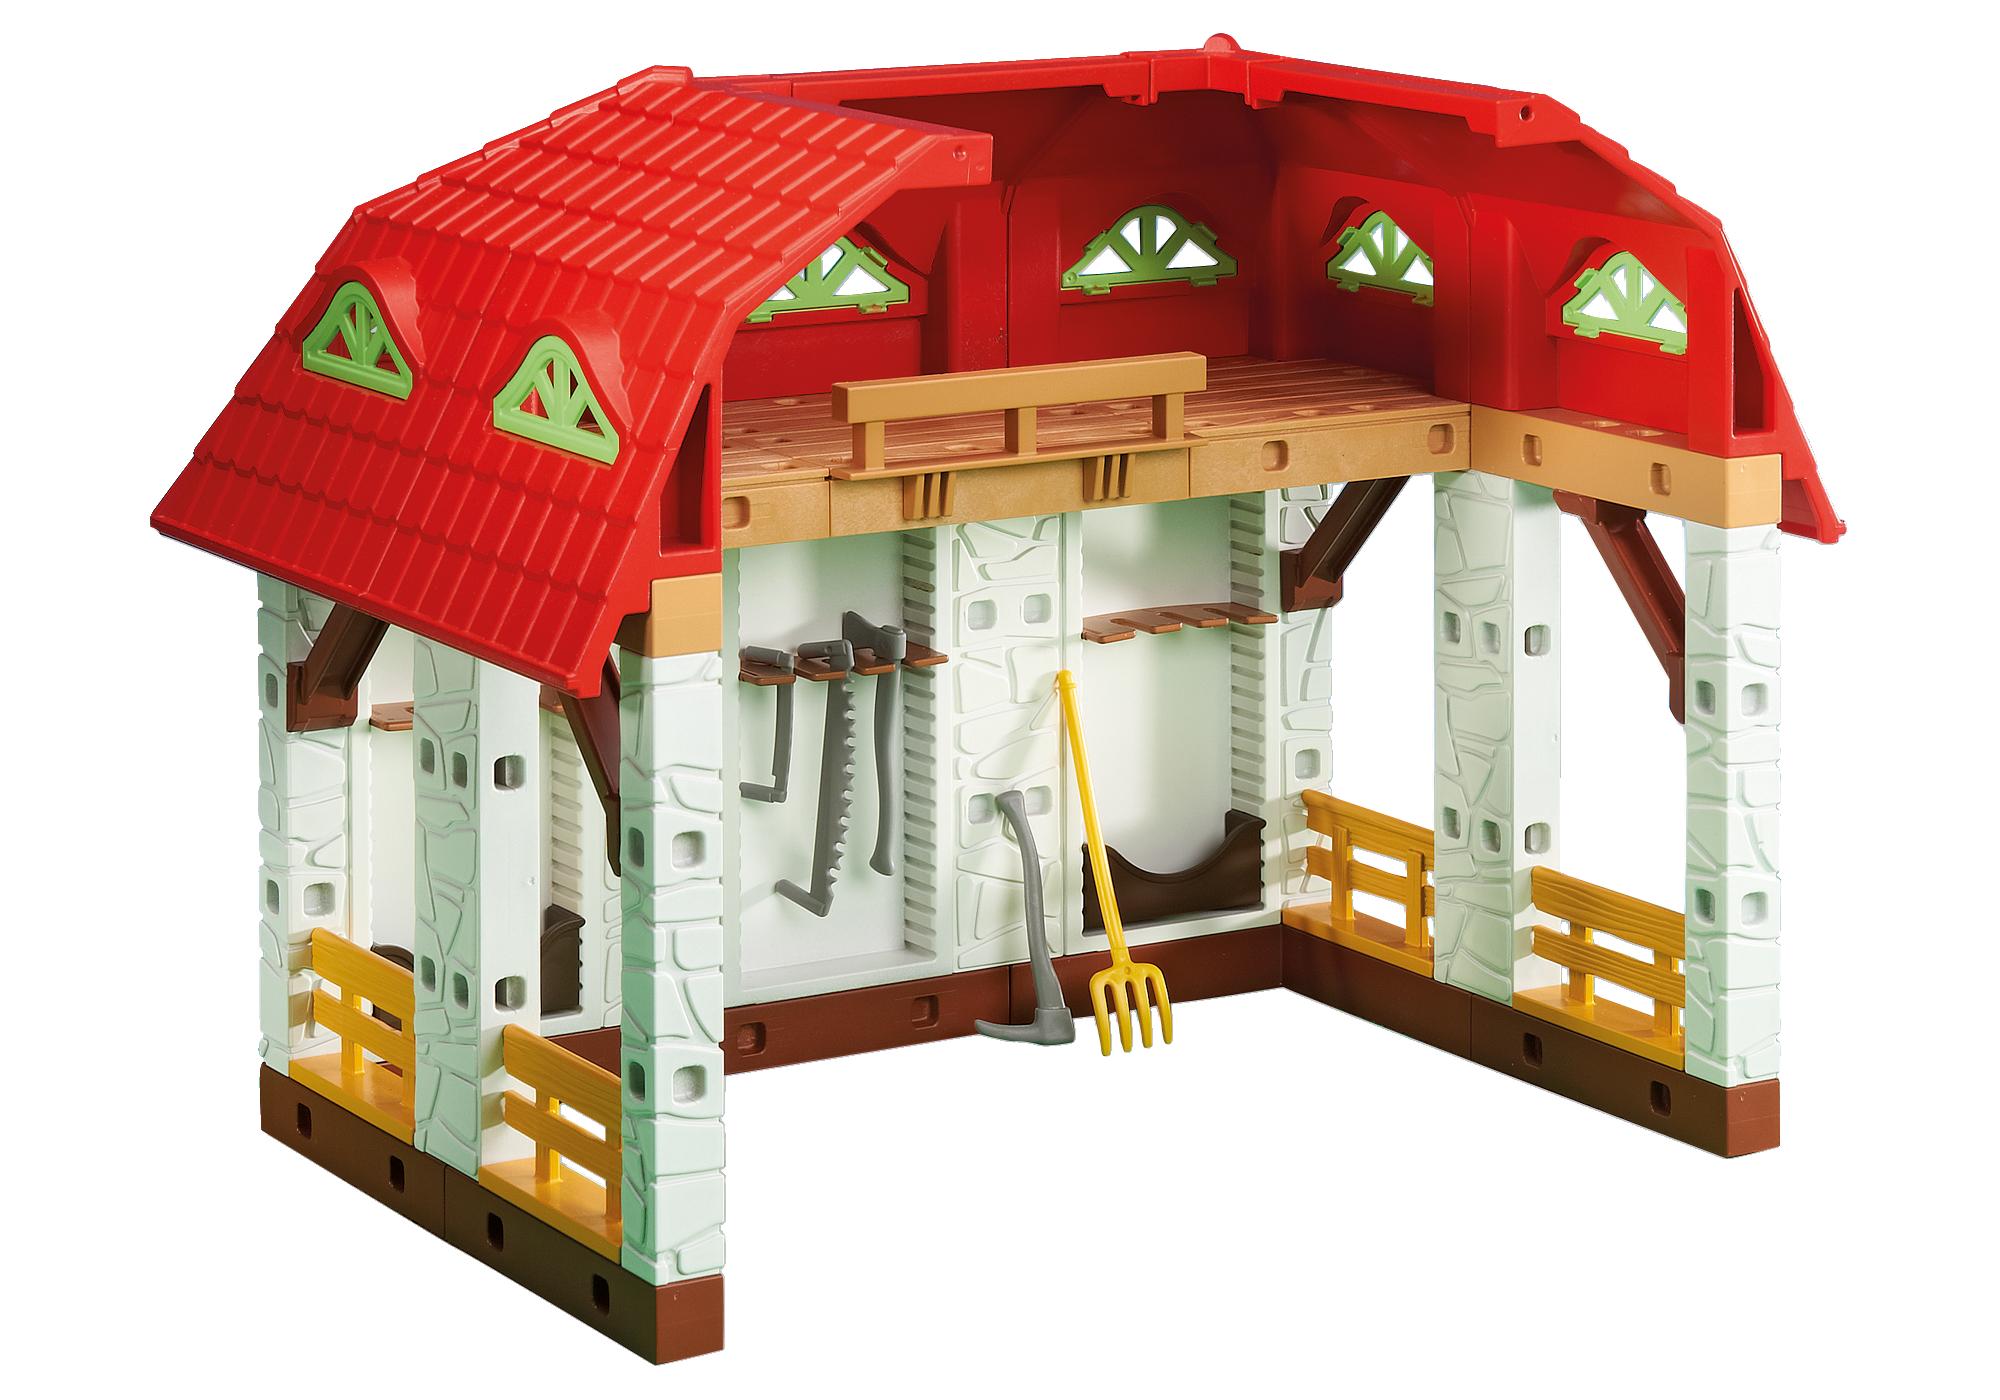 http://media.playmobil.com/i/playmobil/6368_product_detail/Farm Equipment Shed